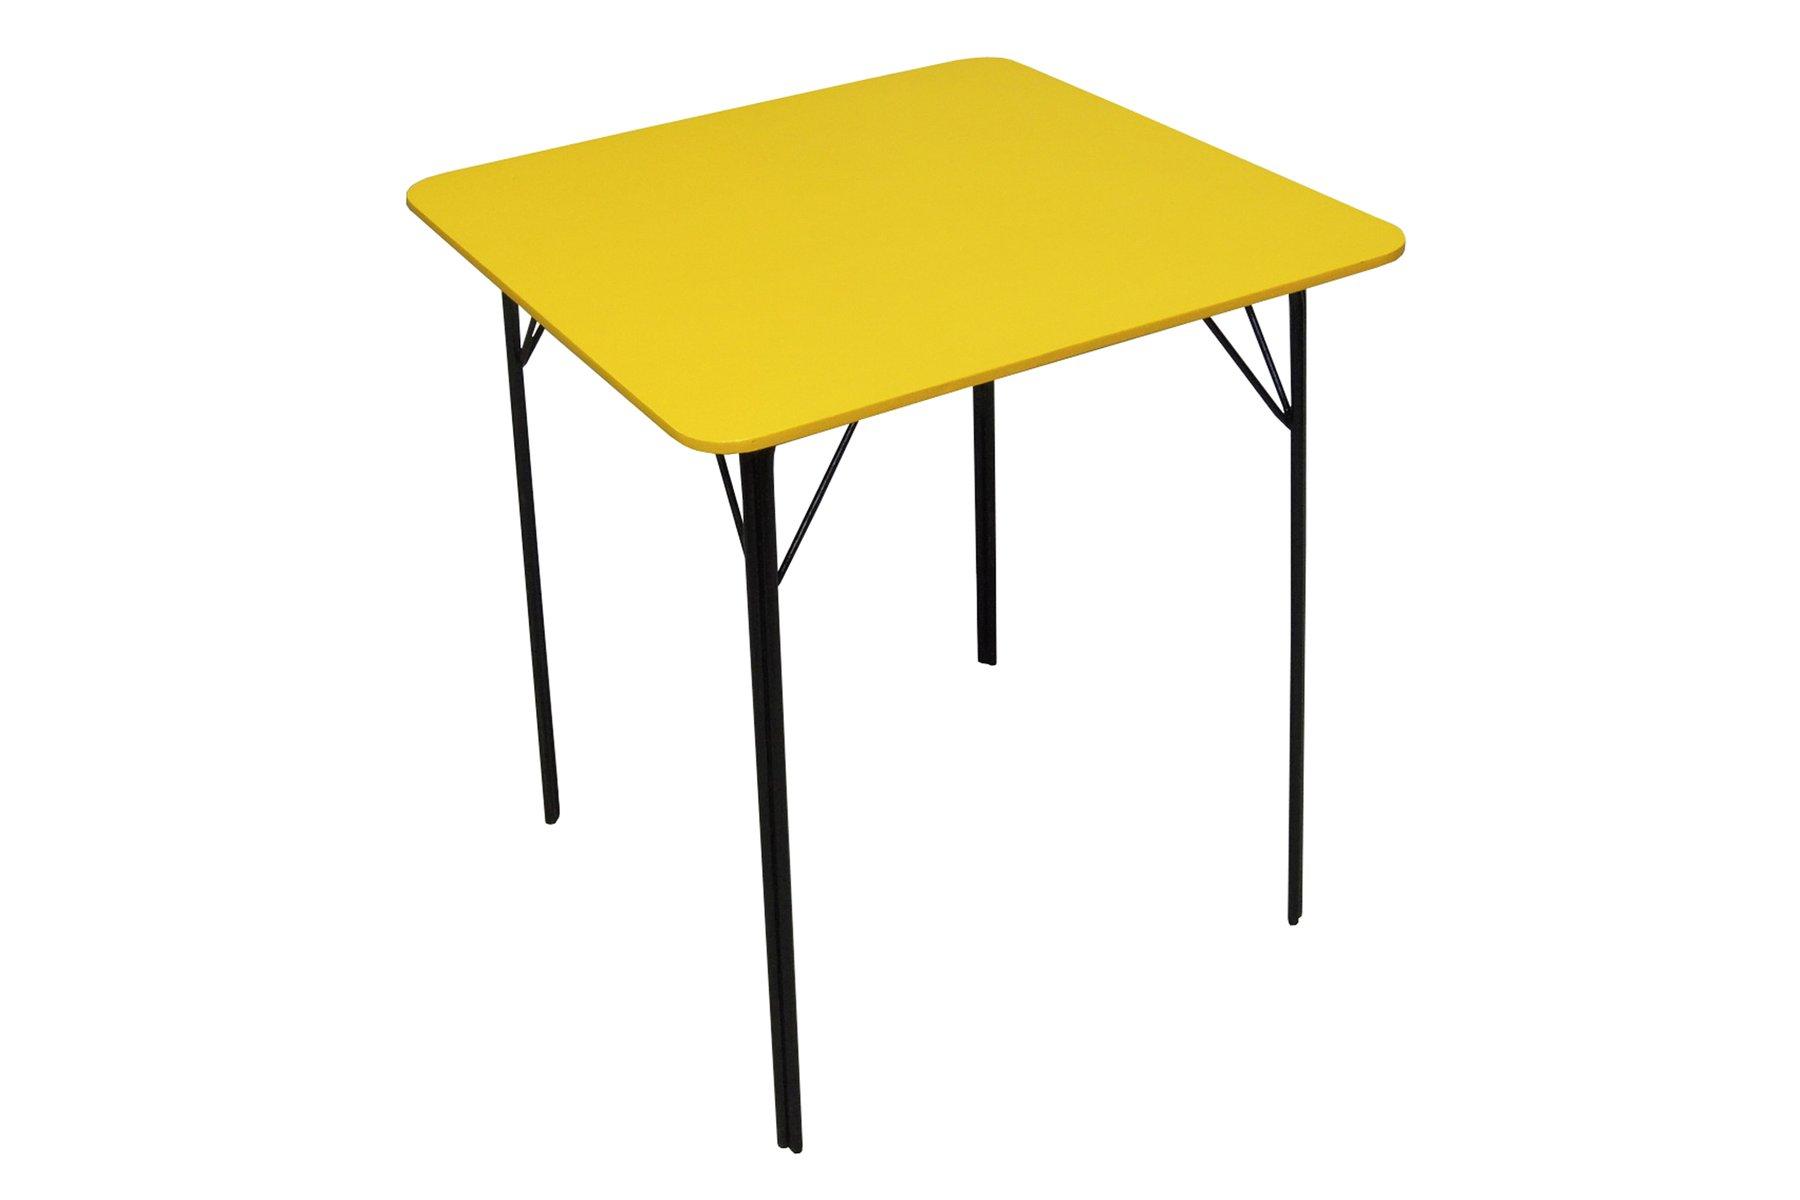 table de salle manger vintage jaune en vente sur pamono. Black Bedroom Furniture Sets. Home Design Ideas